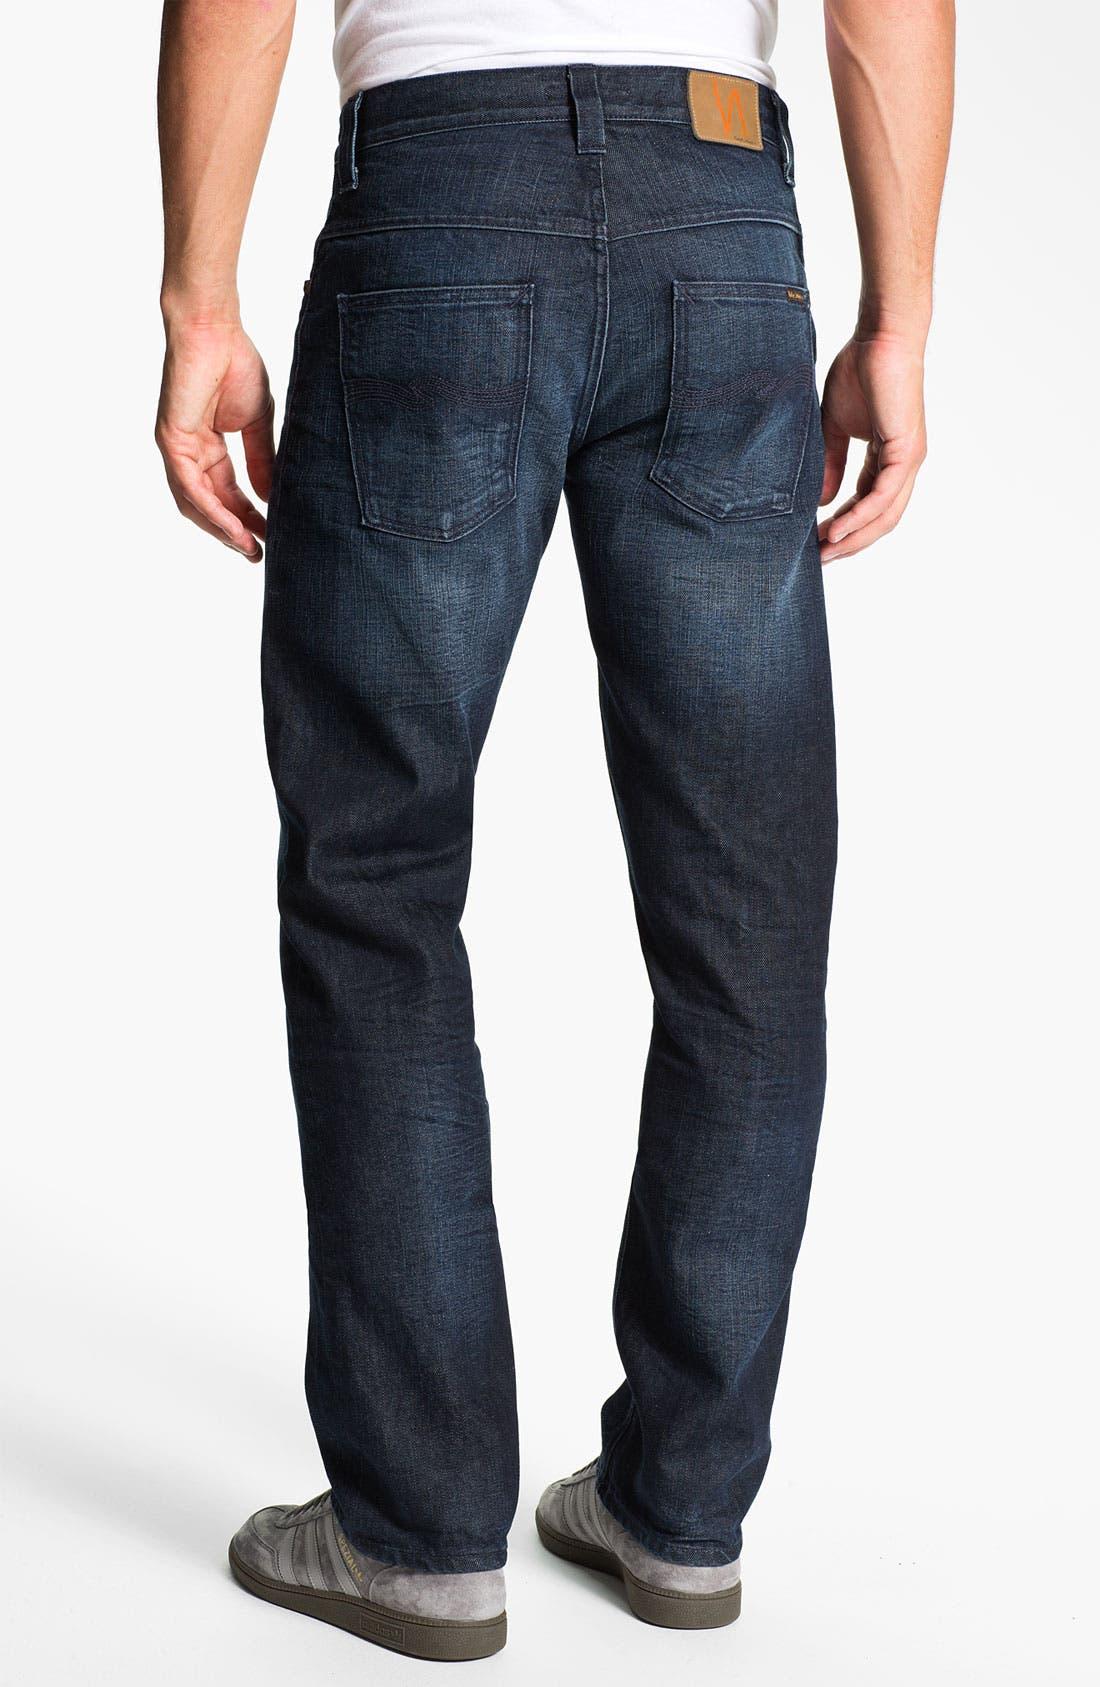 Main Image - Nudie 'Hank Rey' Straight Leg Jeans (Organic All Crinkled Up)